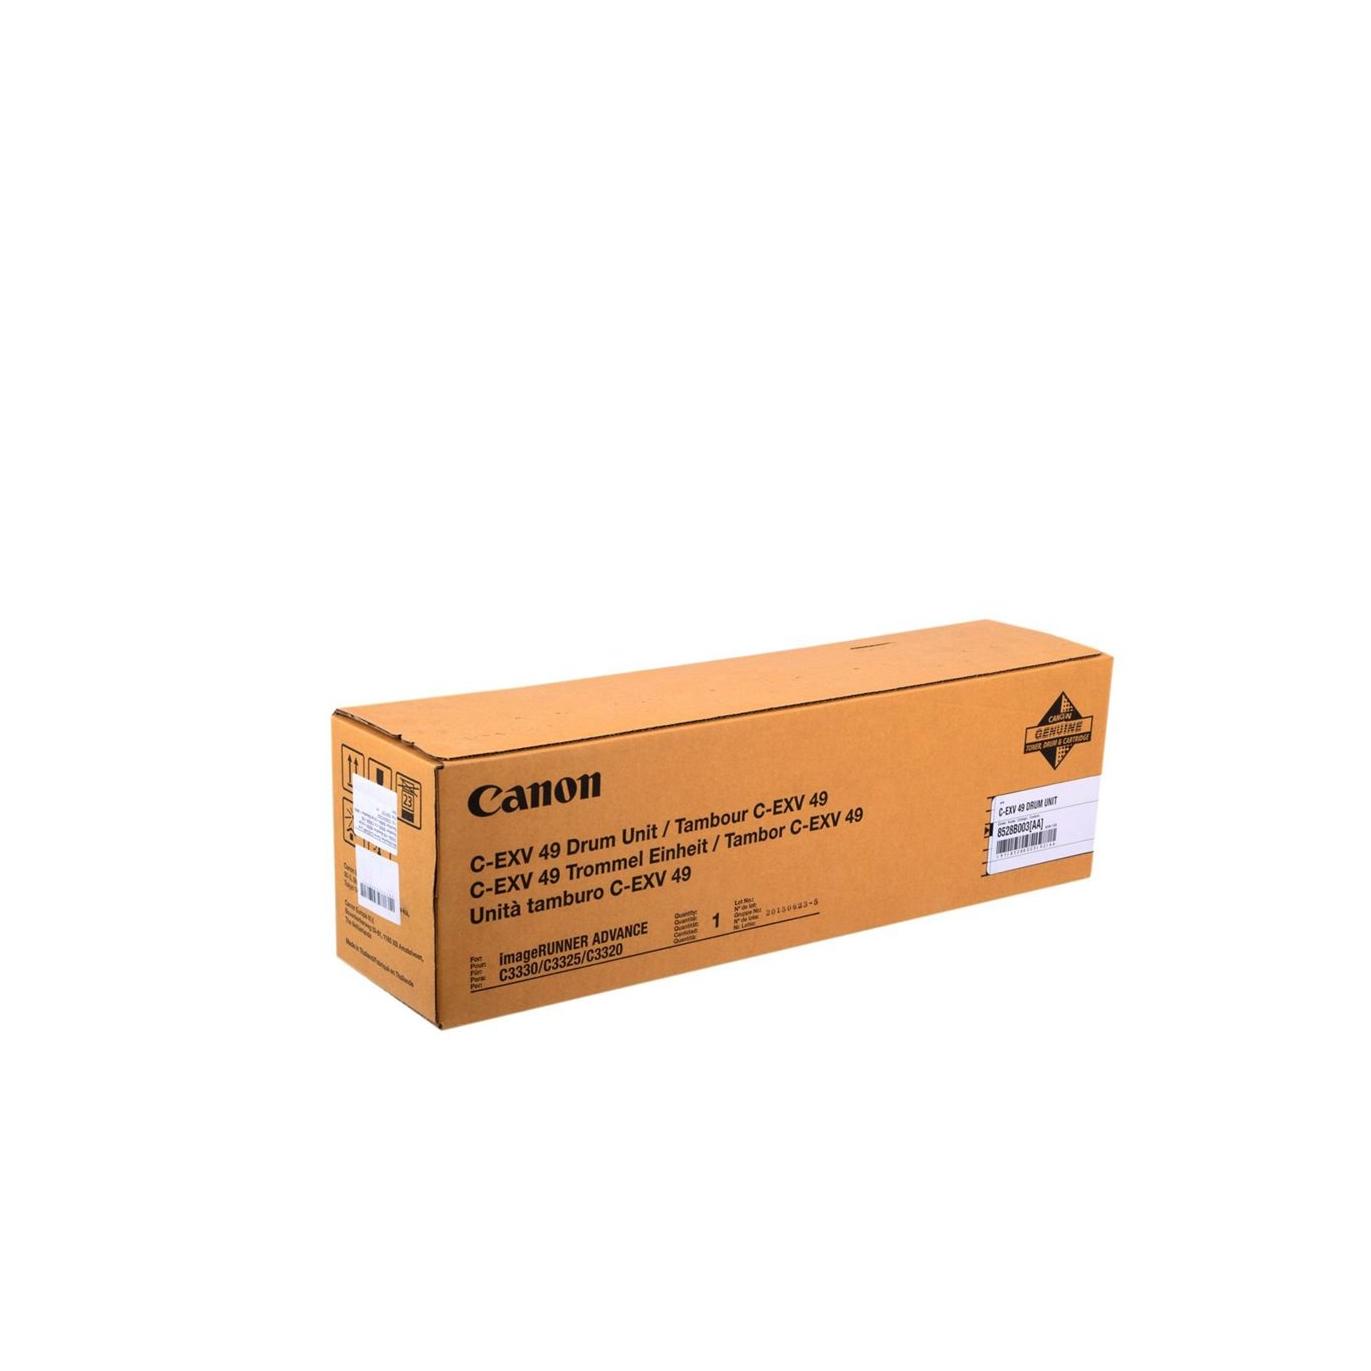 Драм картридж C-EXV49 8528B003